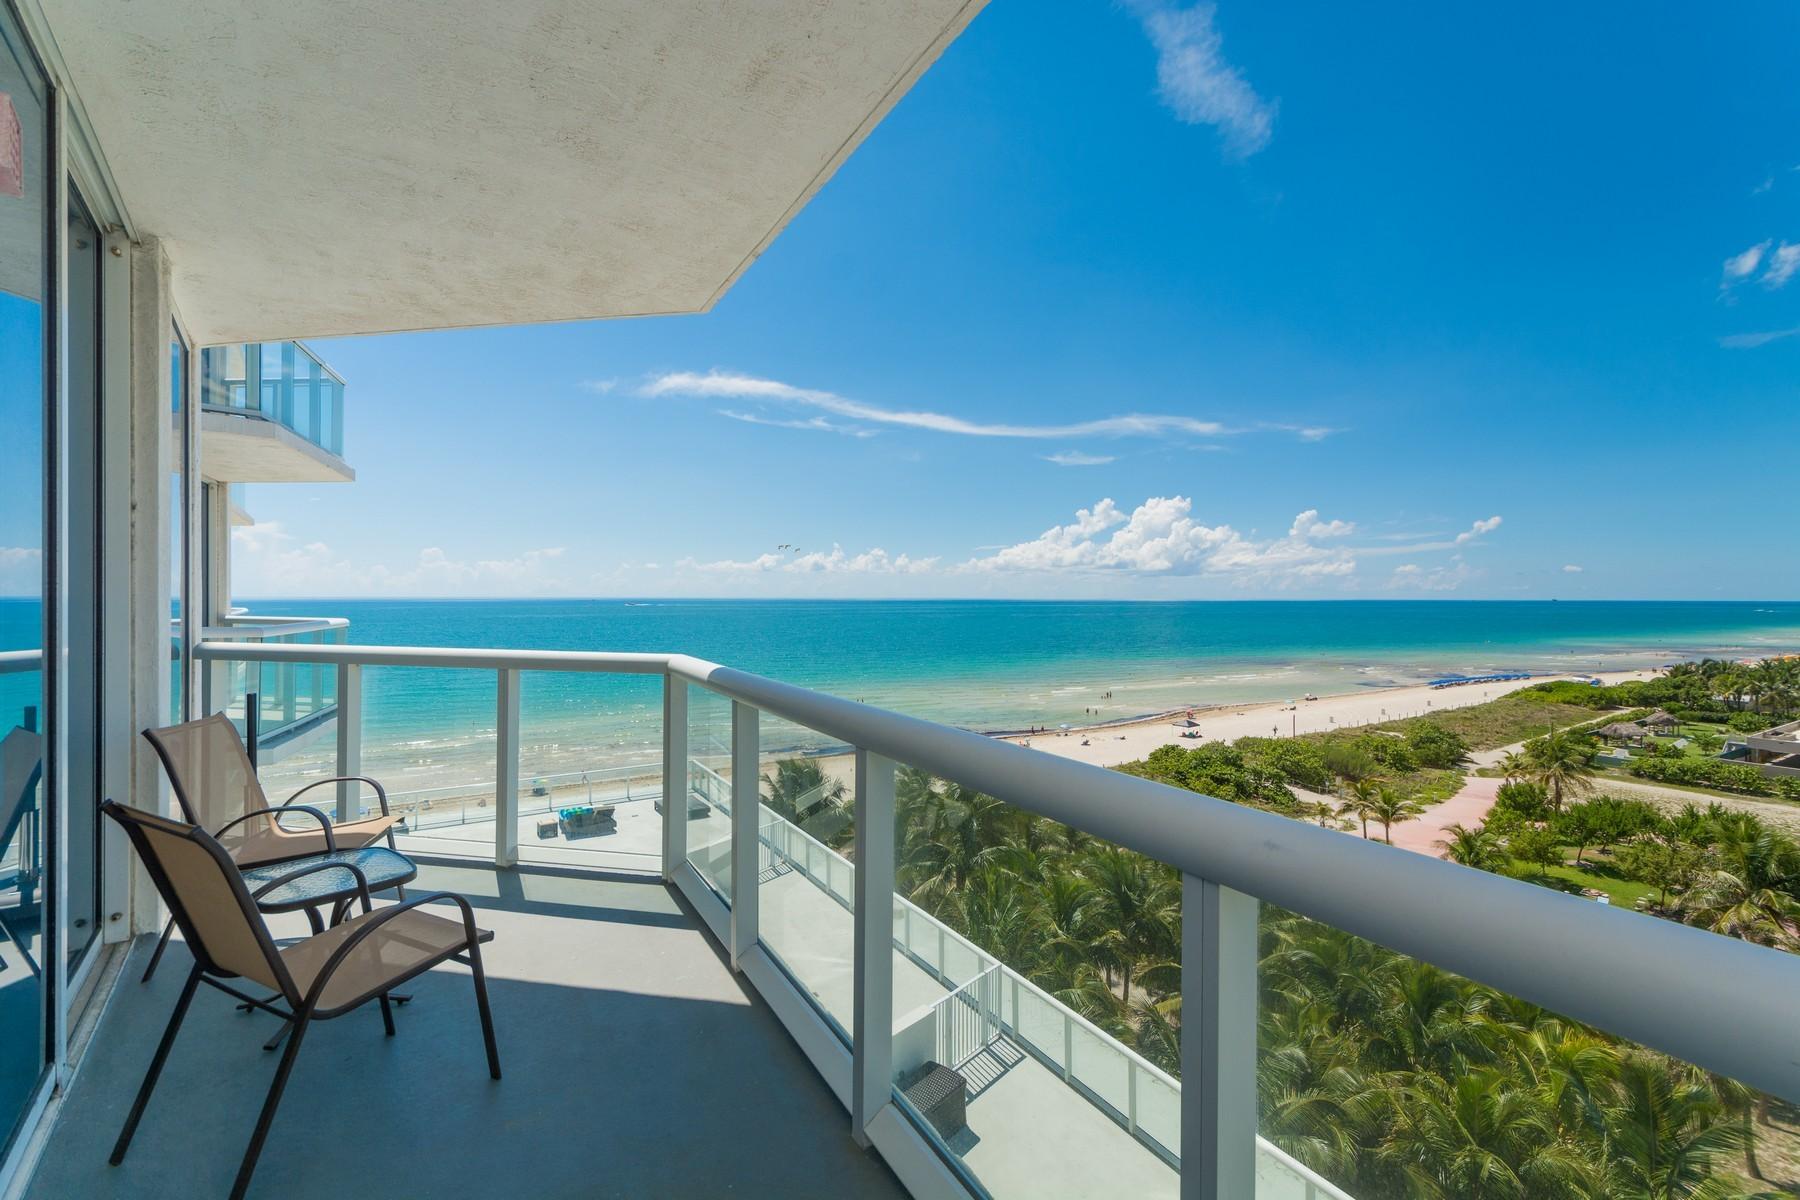 for Sale at 6515 Collins Av #805 6515 Collins Av 805 Miami Beach, Florida, 33141 United States